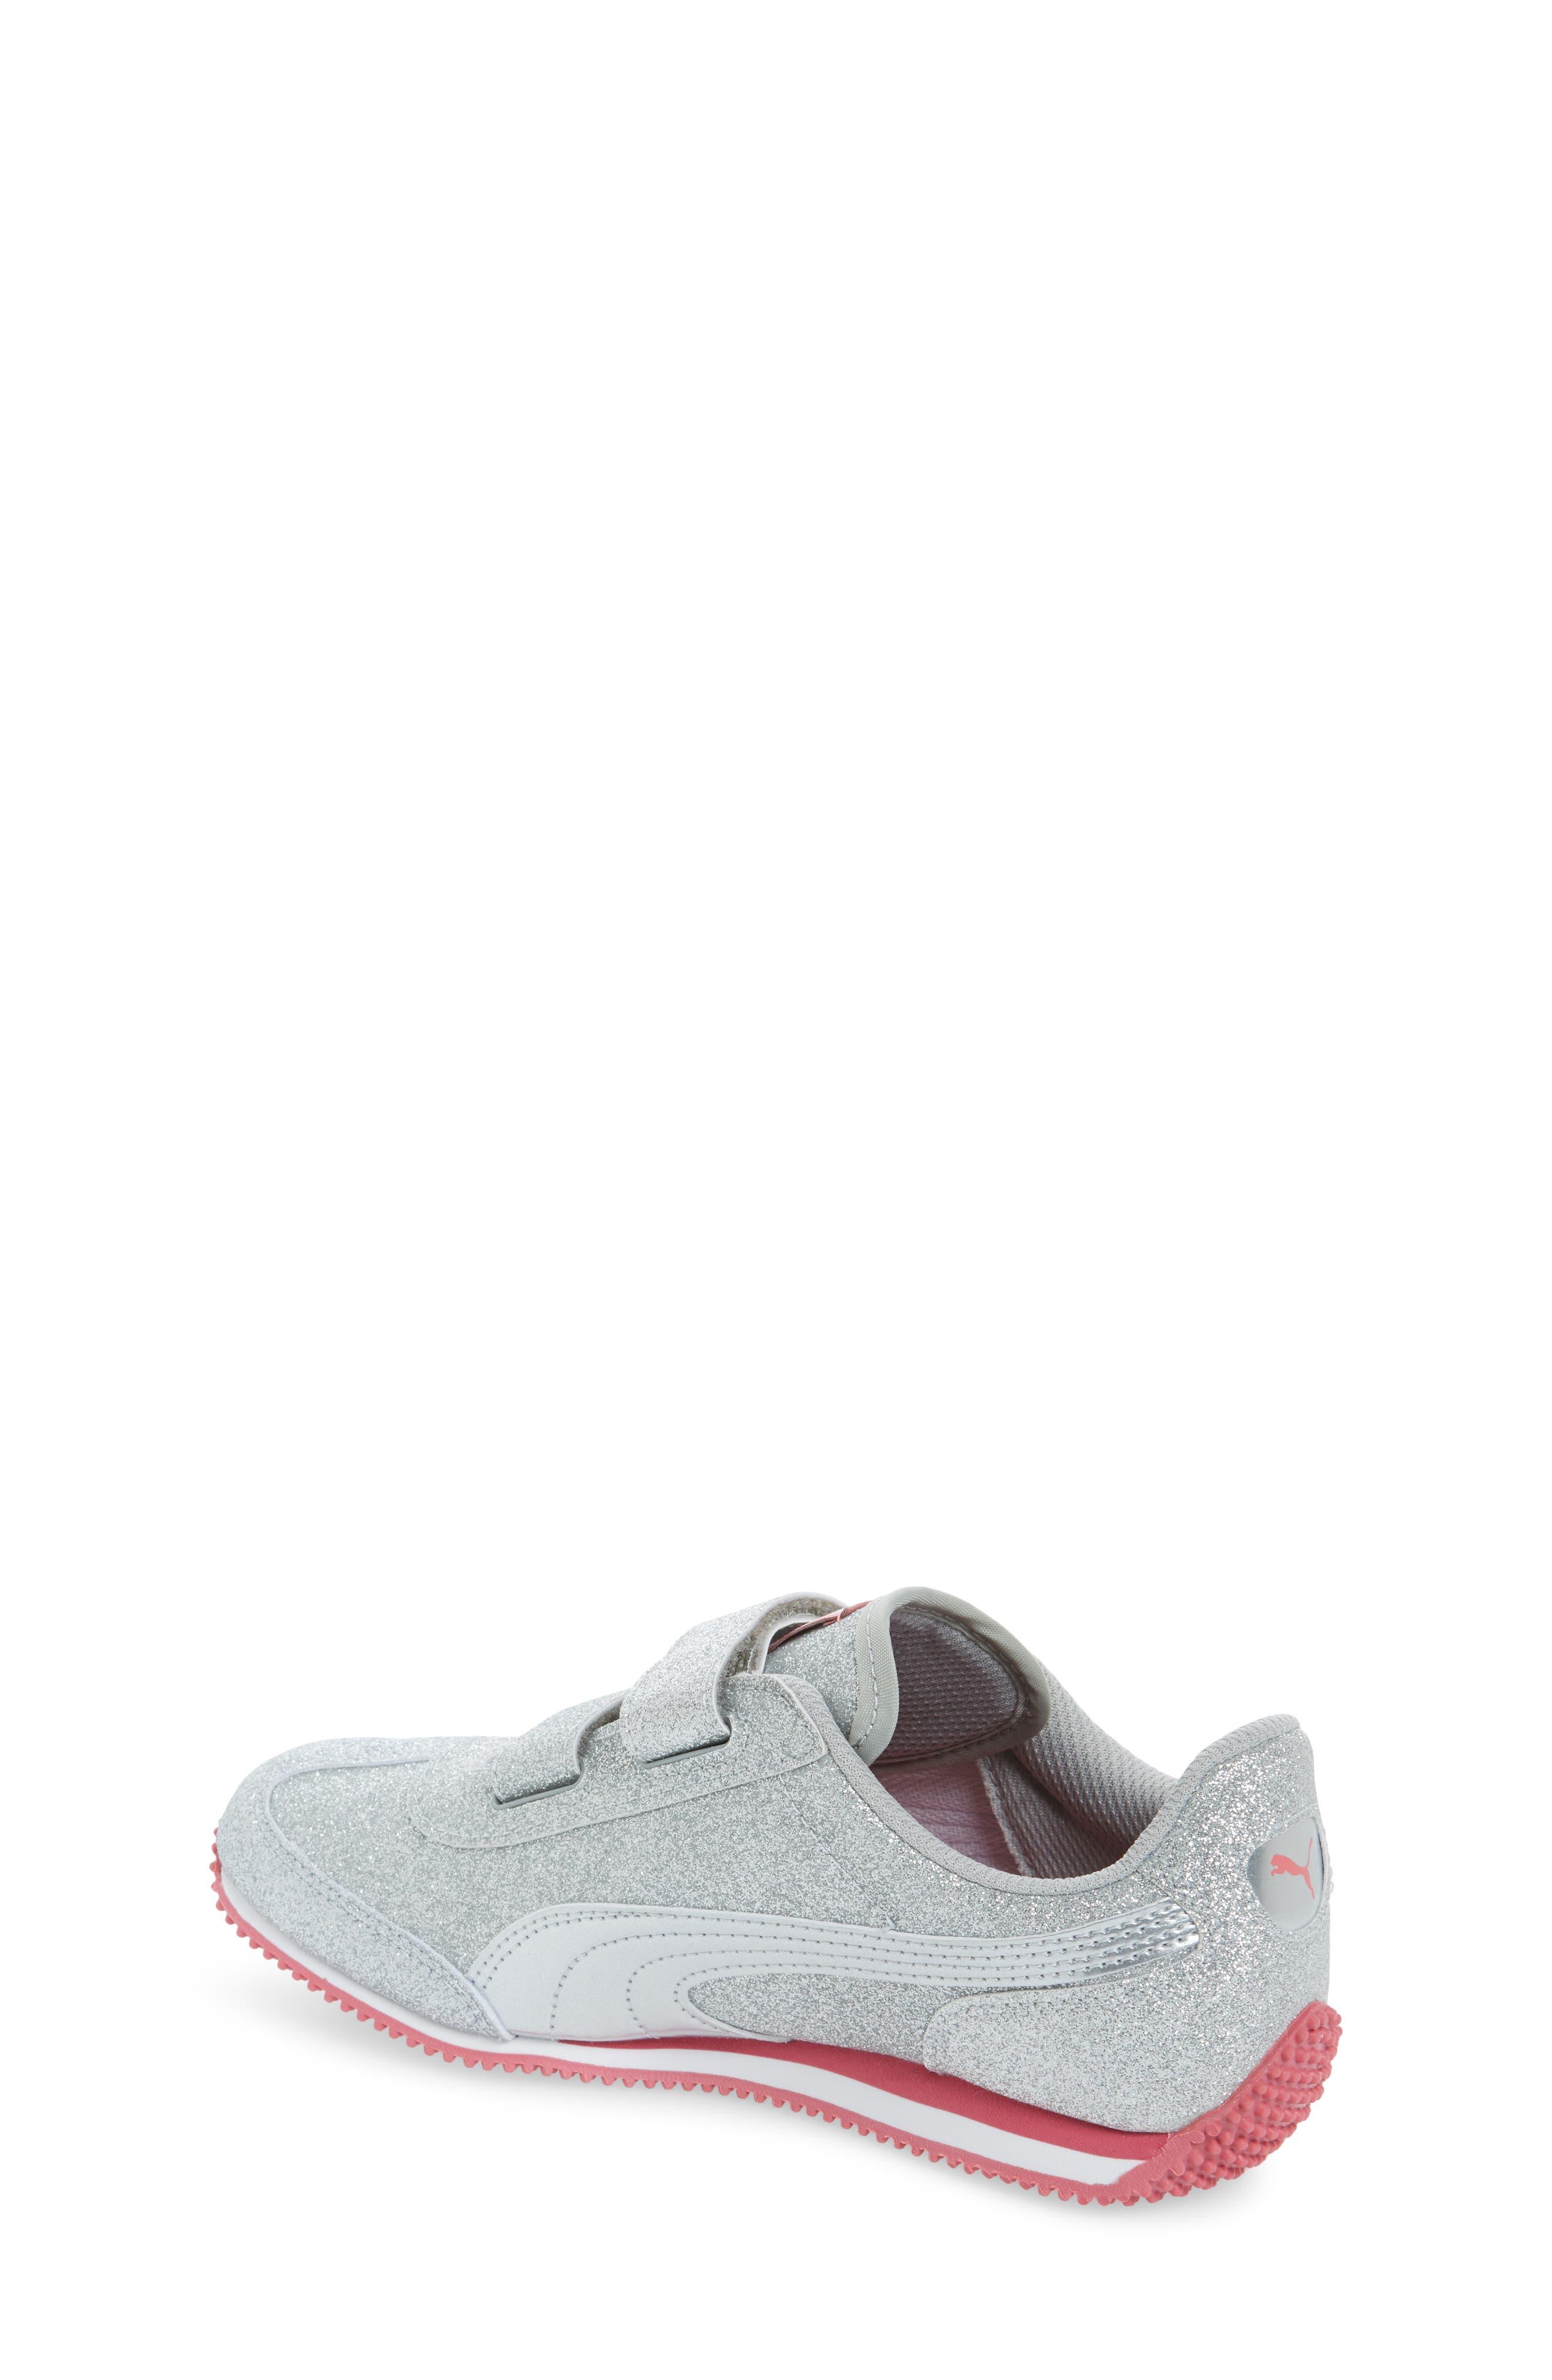 Whirlwind Glitz Sneaker,                             Alternate thumbnail 2, color,                             040